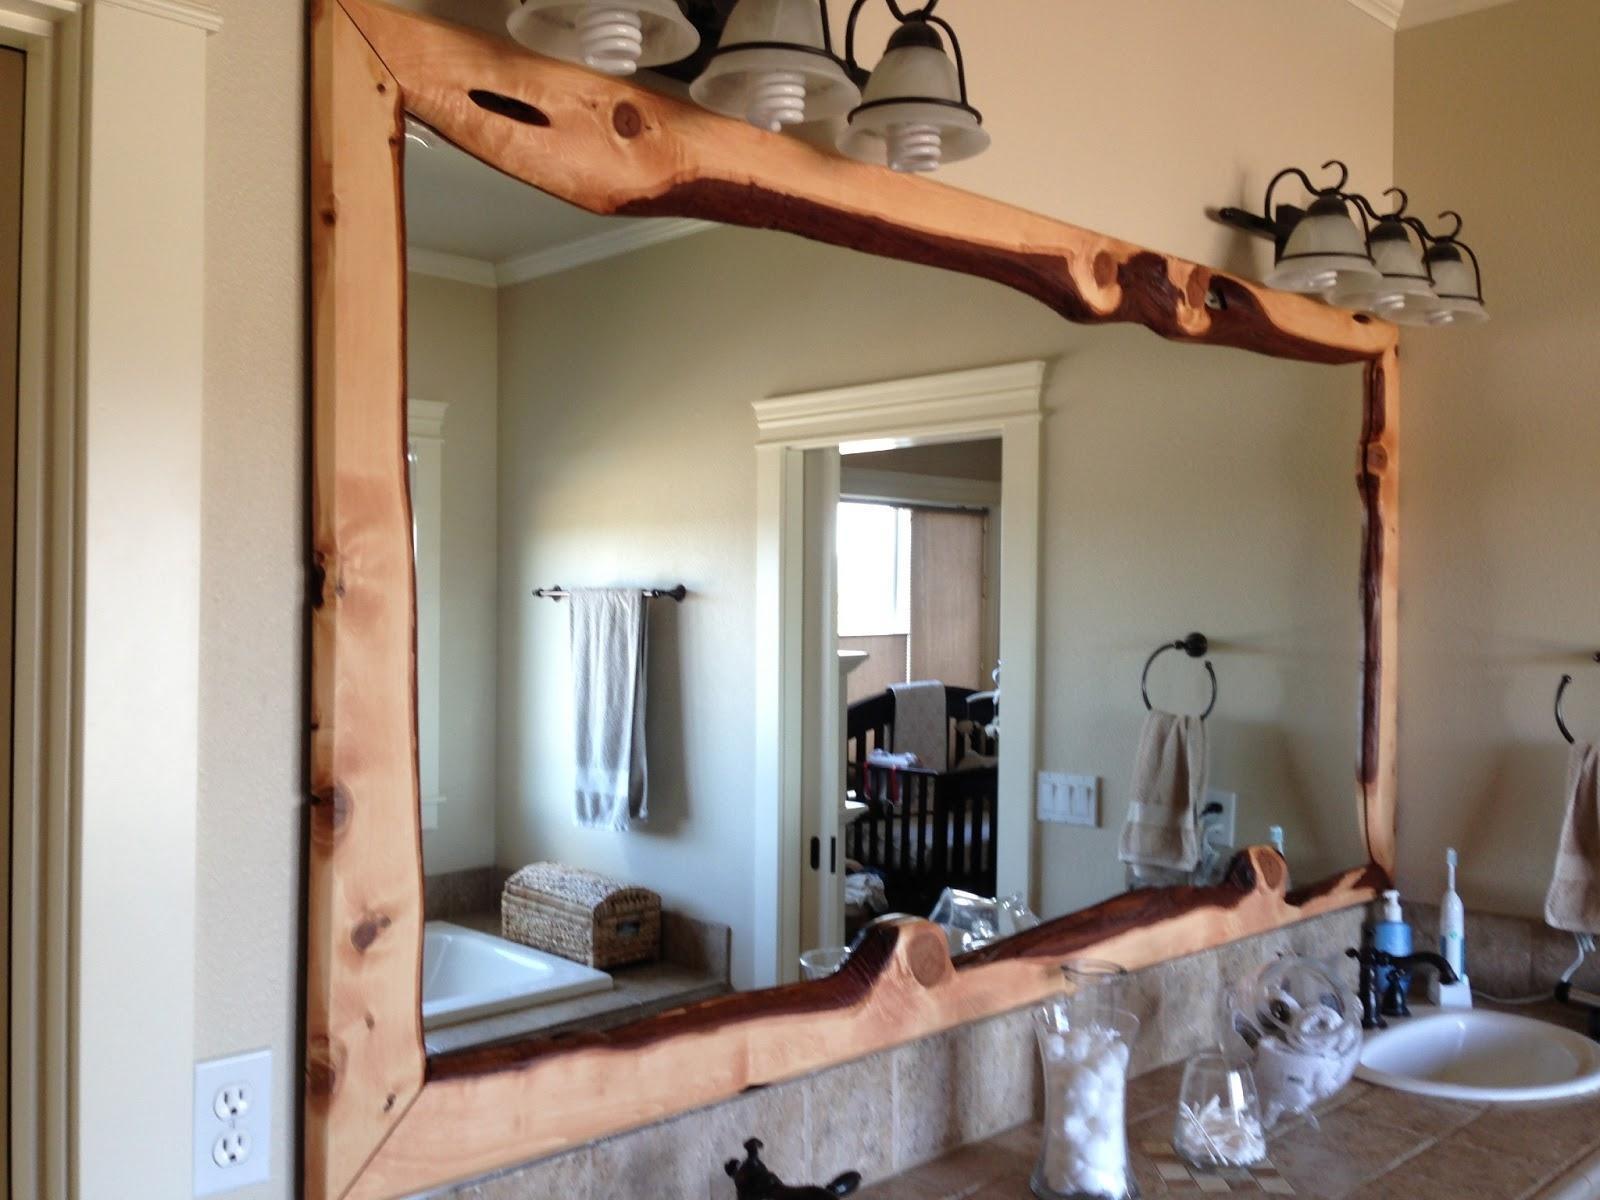 Oak Framed Wall Mirror 123 Beautiful Decoration Also This Oak Within Oak Framed Wall Mirror (Image 13 of 20)